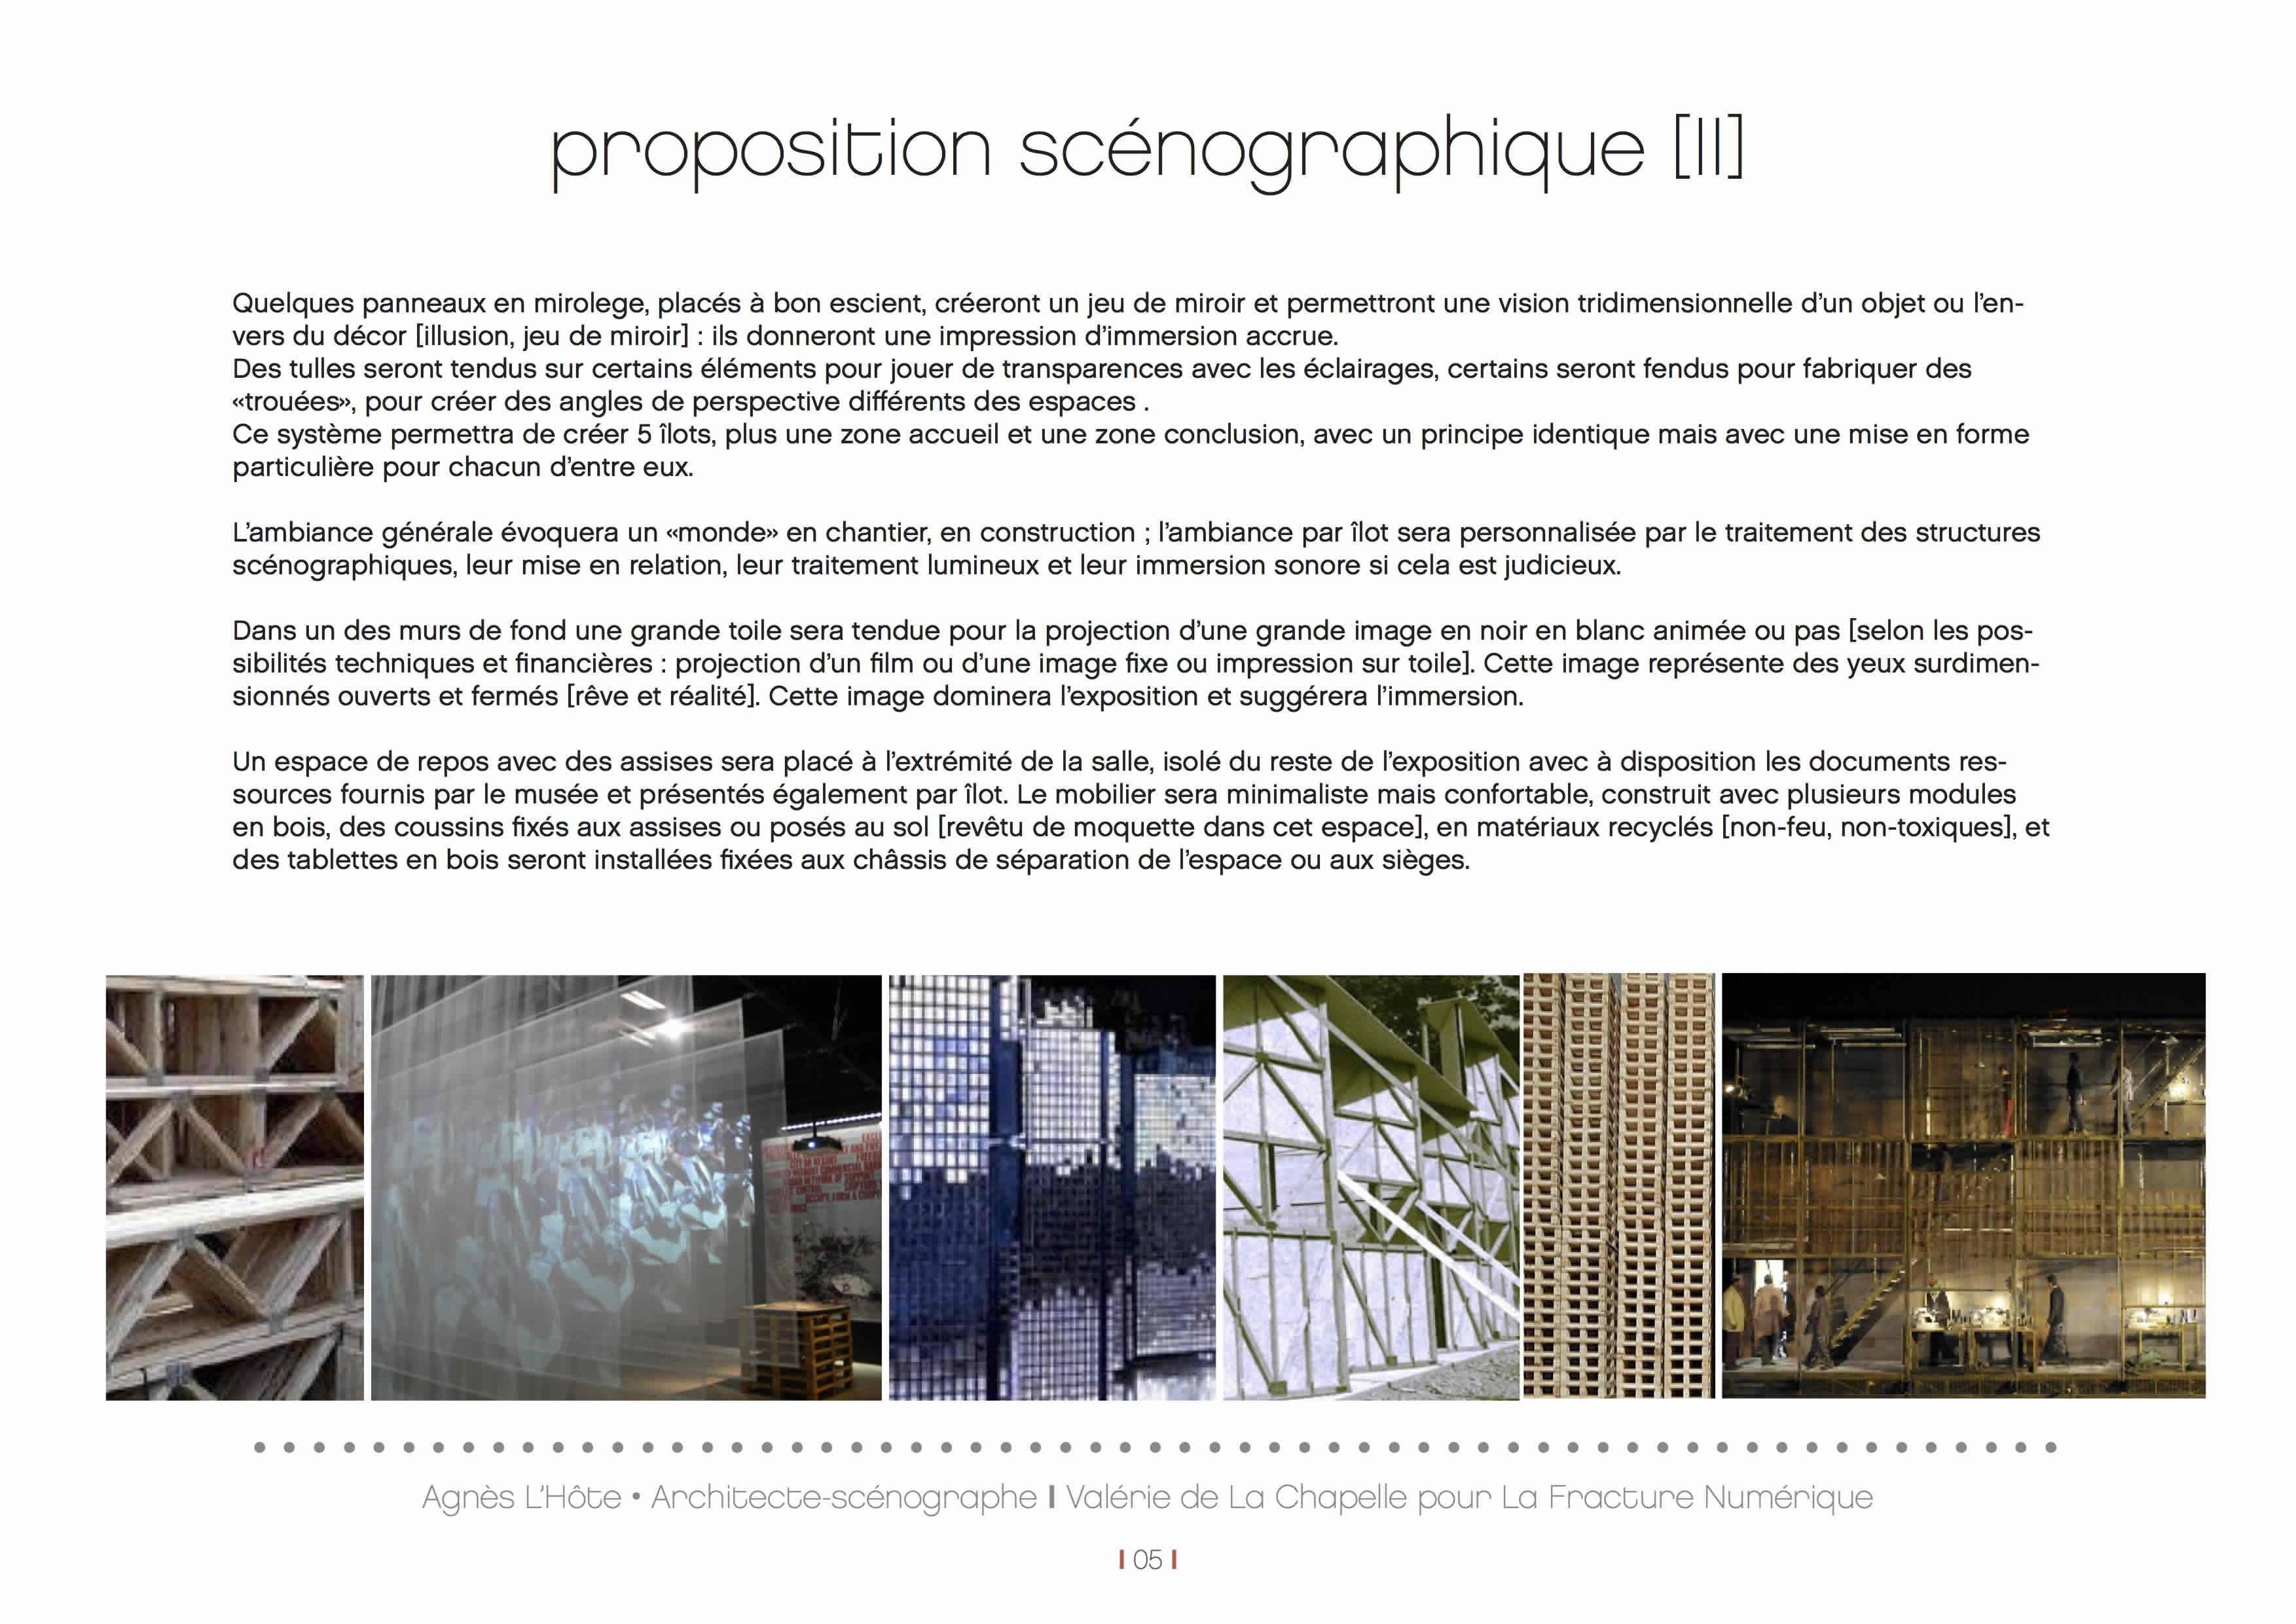 proposition scénographie exposition